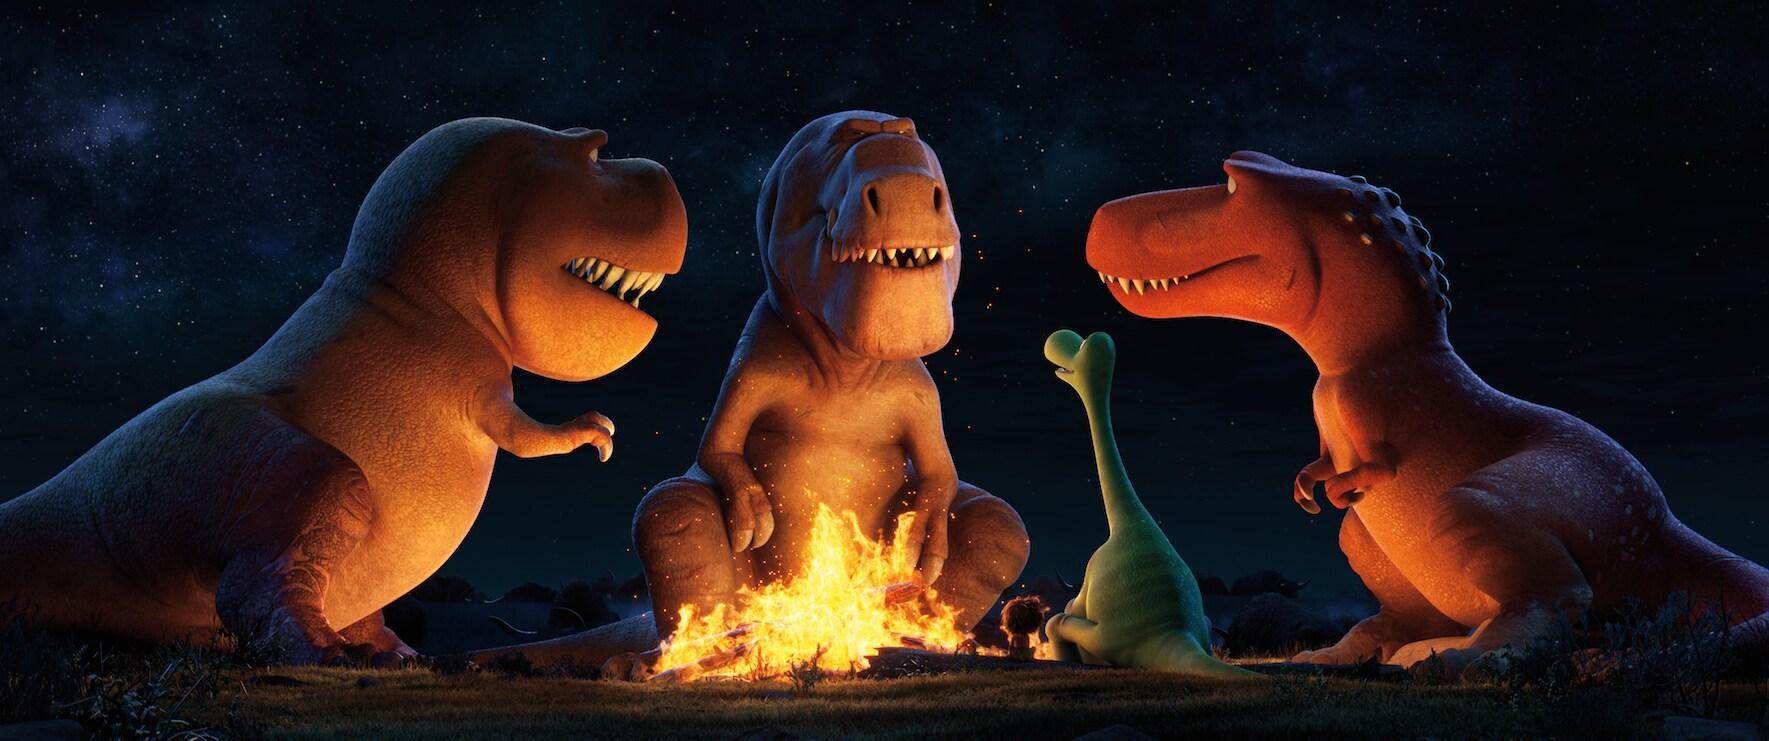 "Sam Elliott (Butch), Anna Paquin (Ramsey), A.J. Buckley (Nash), Raymond Ochoa (Arlo), and Jack Bright(Spot) sitting at a camp fire in ""The Good Dinosaur"""